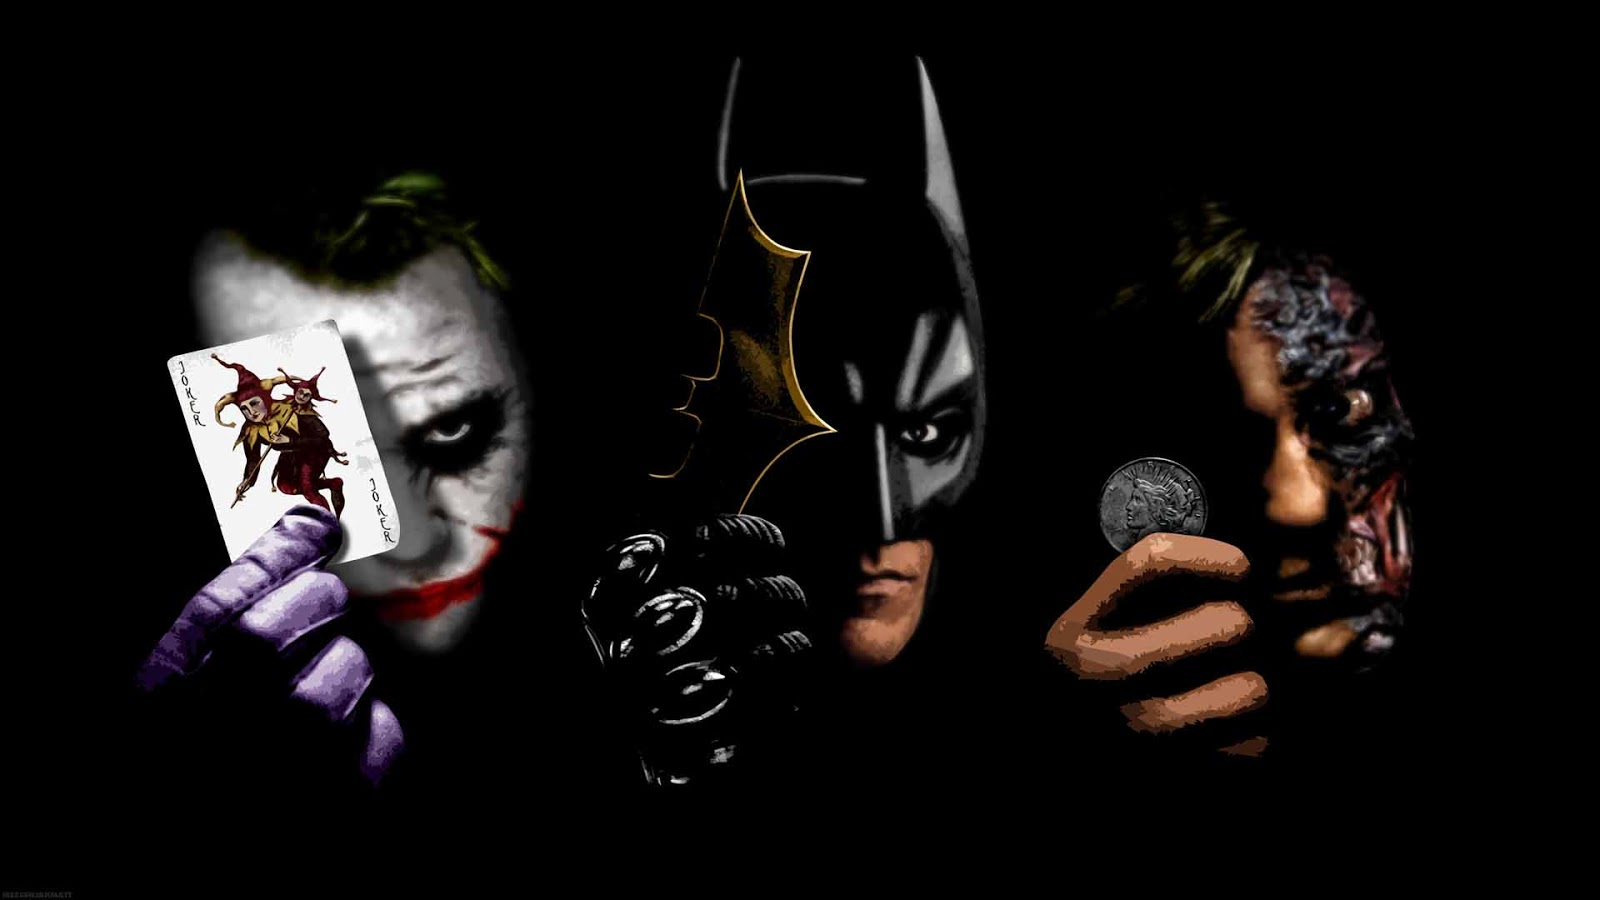 Joker HD Wallpapers HD Wallpapers Pics 1600x900